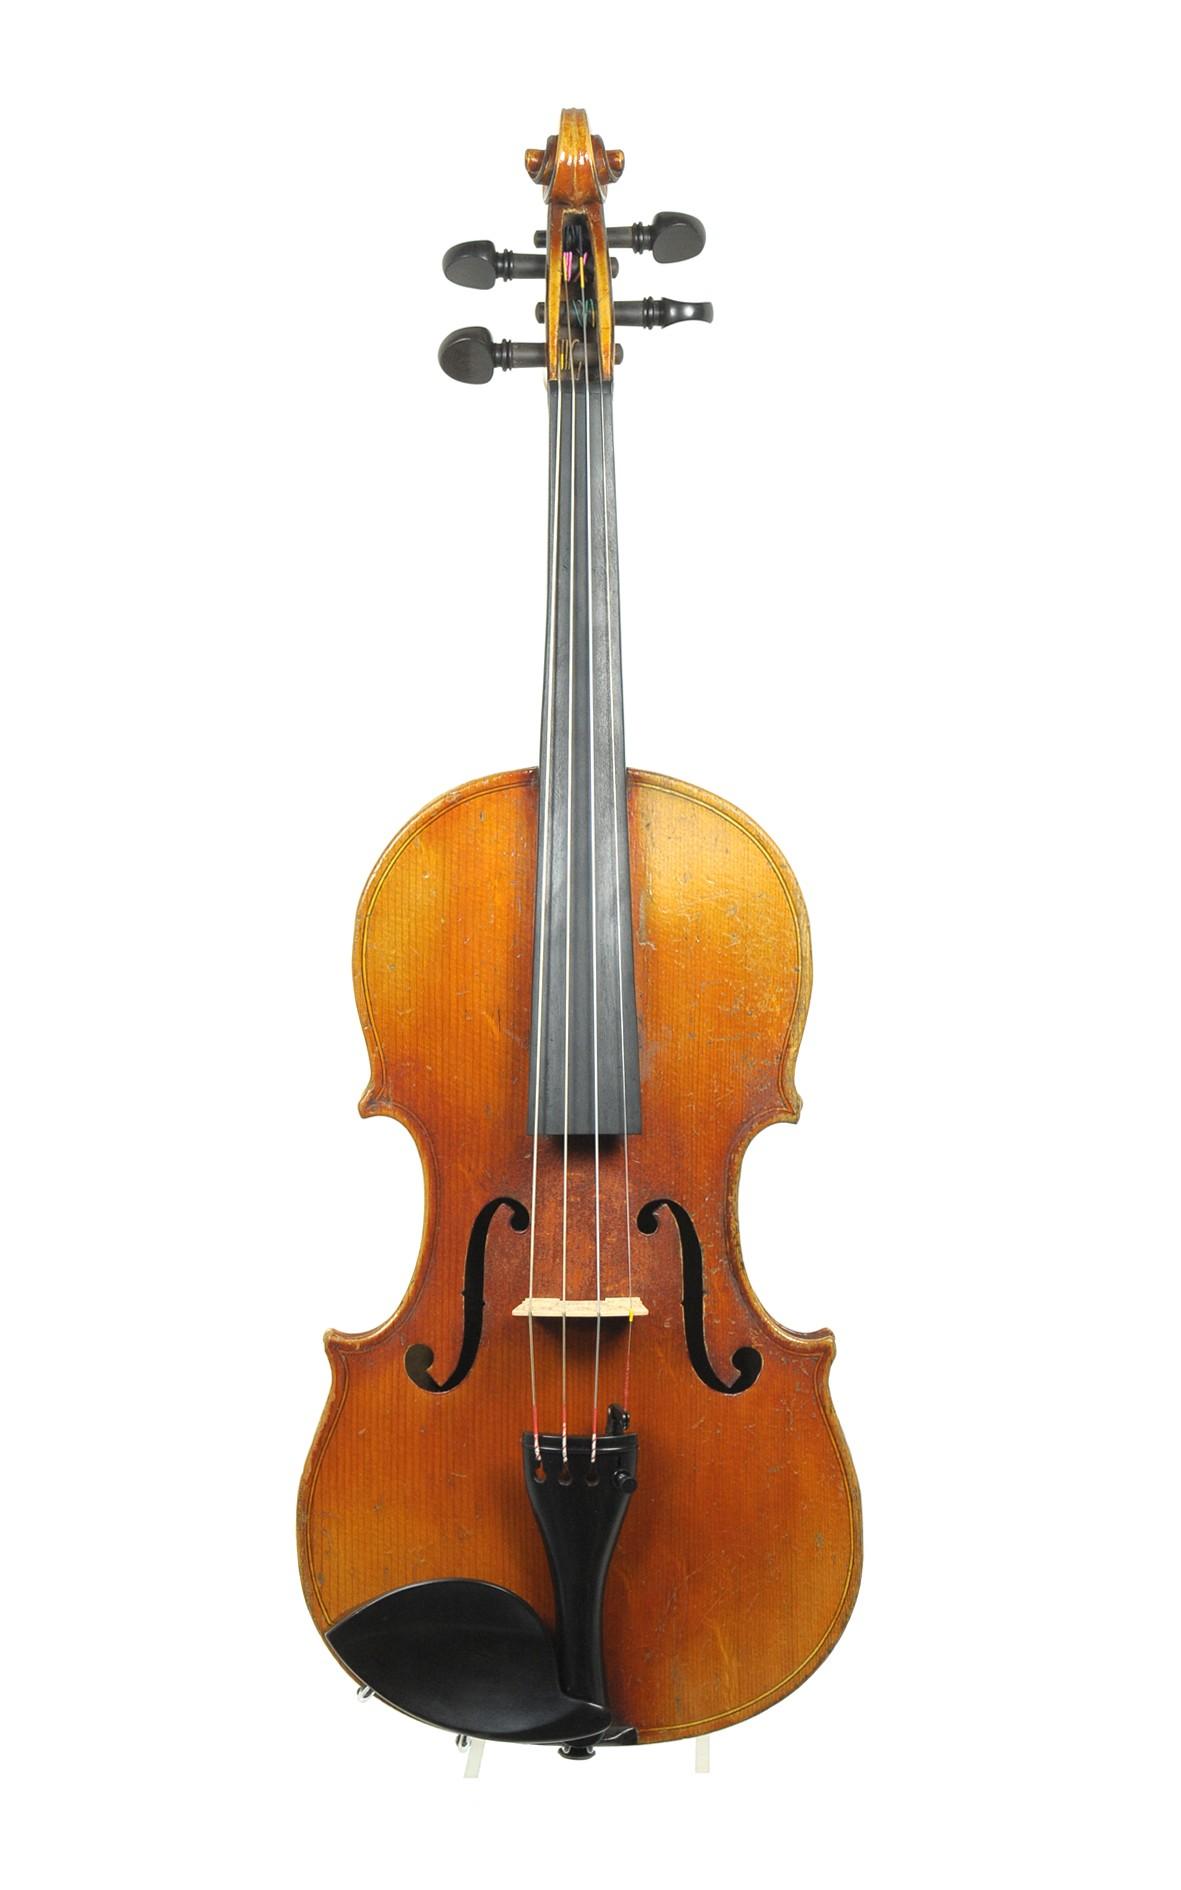 Copie de Antonius Stradivarius Cremonensis - French violin, approx. 1920 - top